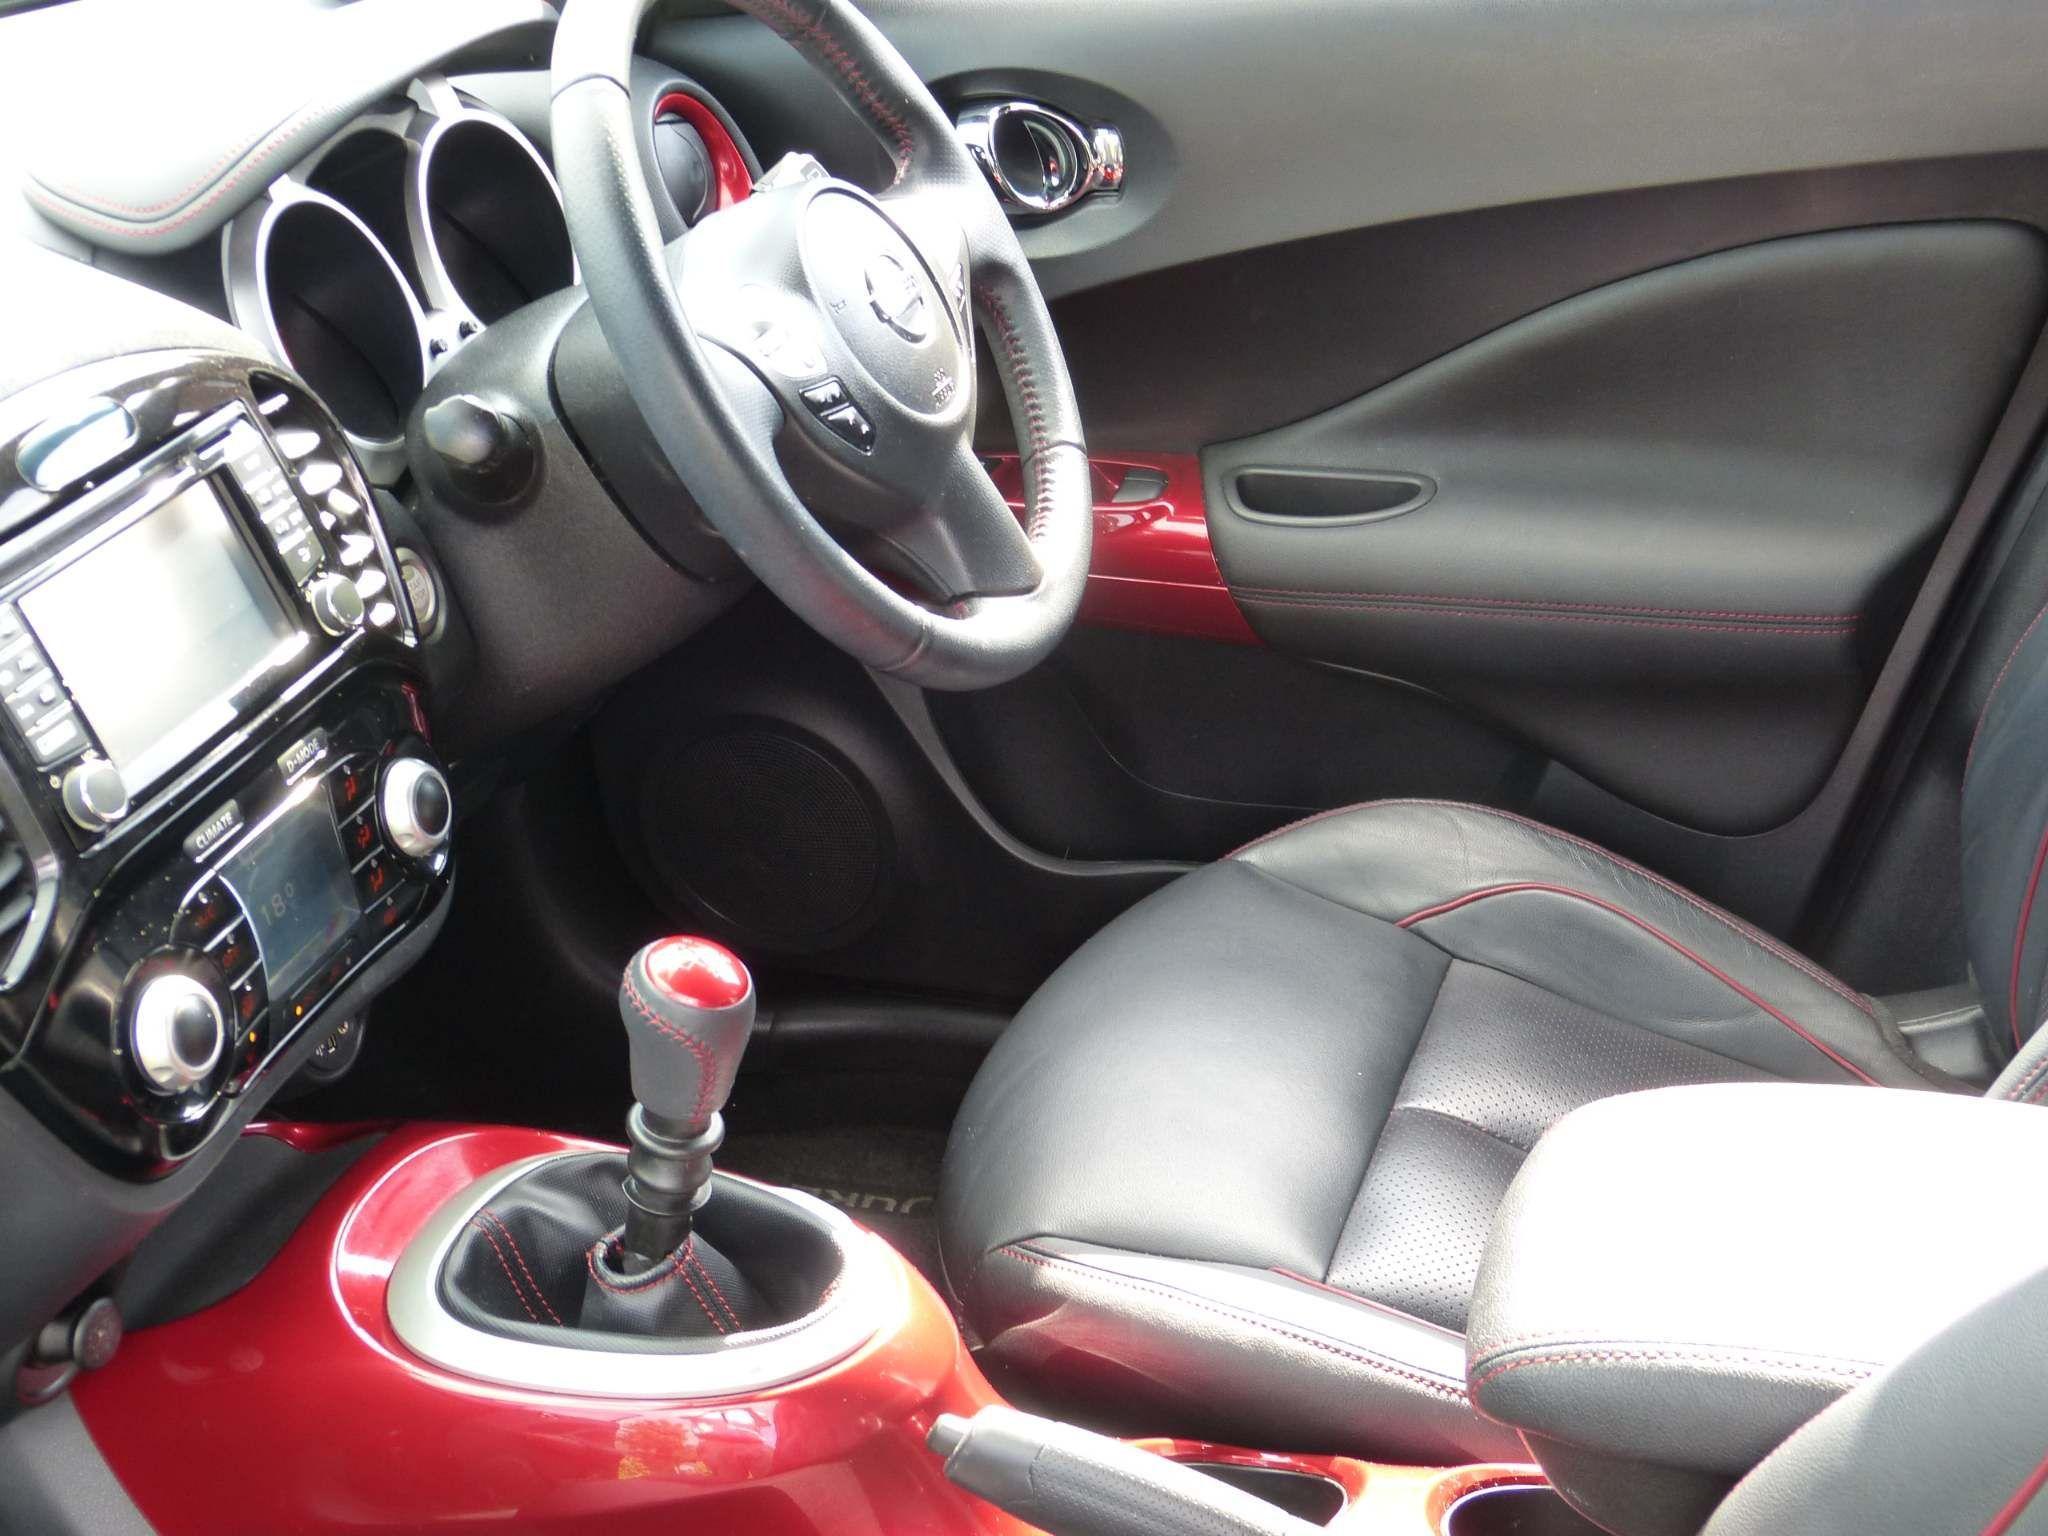 2016 NISSAN Juke 1.2 DIG-T Tekna (s/s) Petrol Manual  – Beechlawn Motors Belfast full